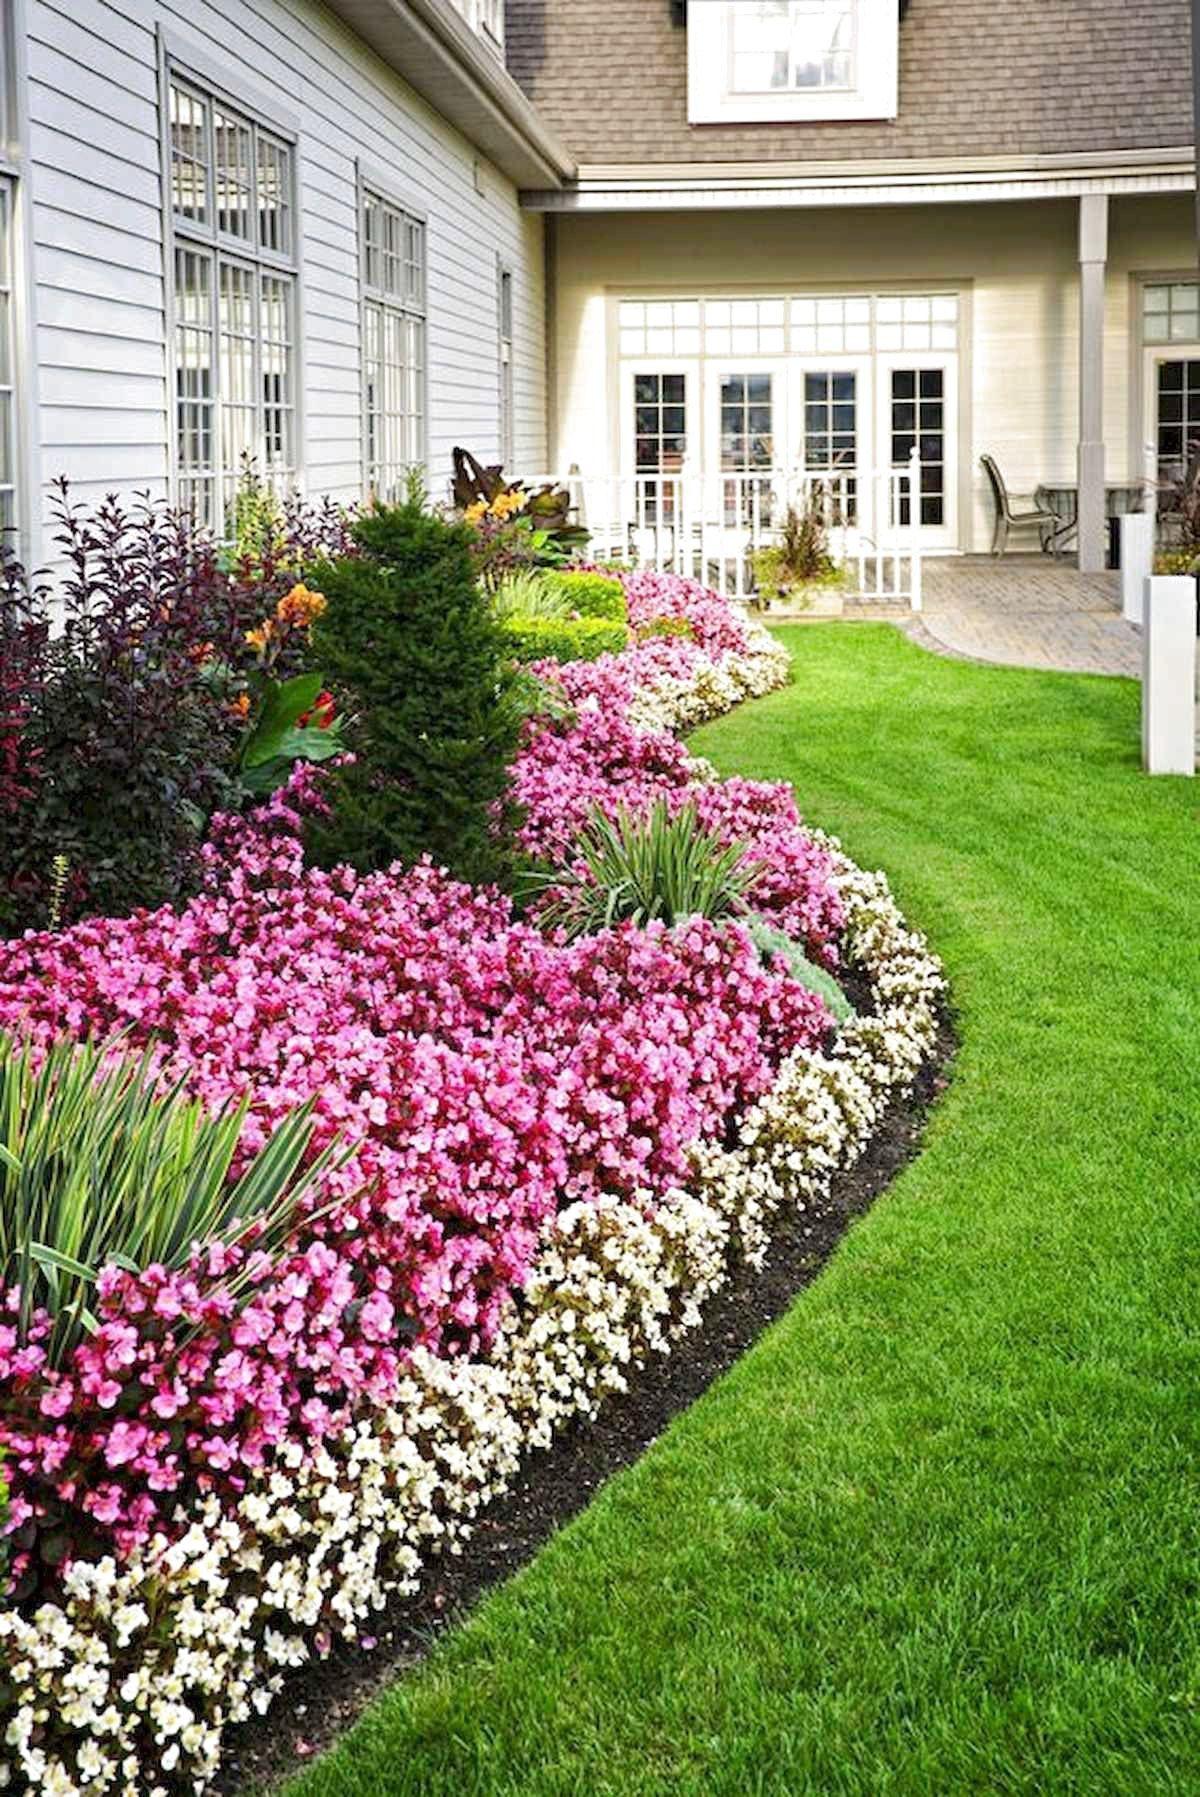 44 Beautiful Front Yard Garden Landscaping Design Ideas ... on Front Yard Renovation Ideas id=32408